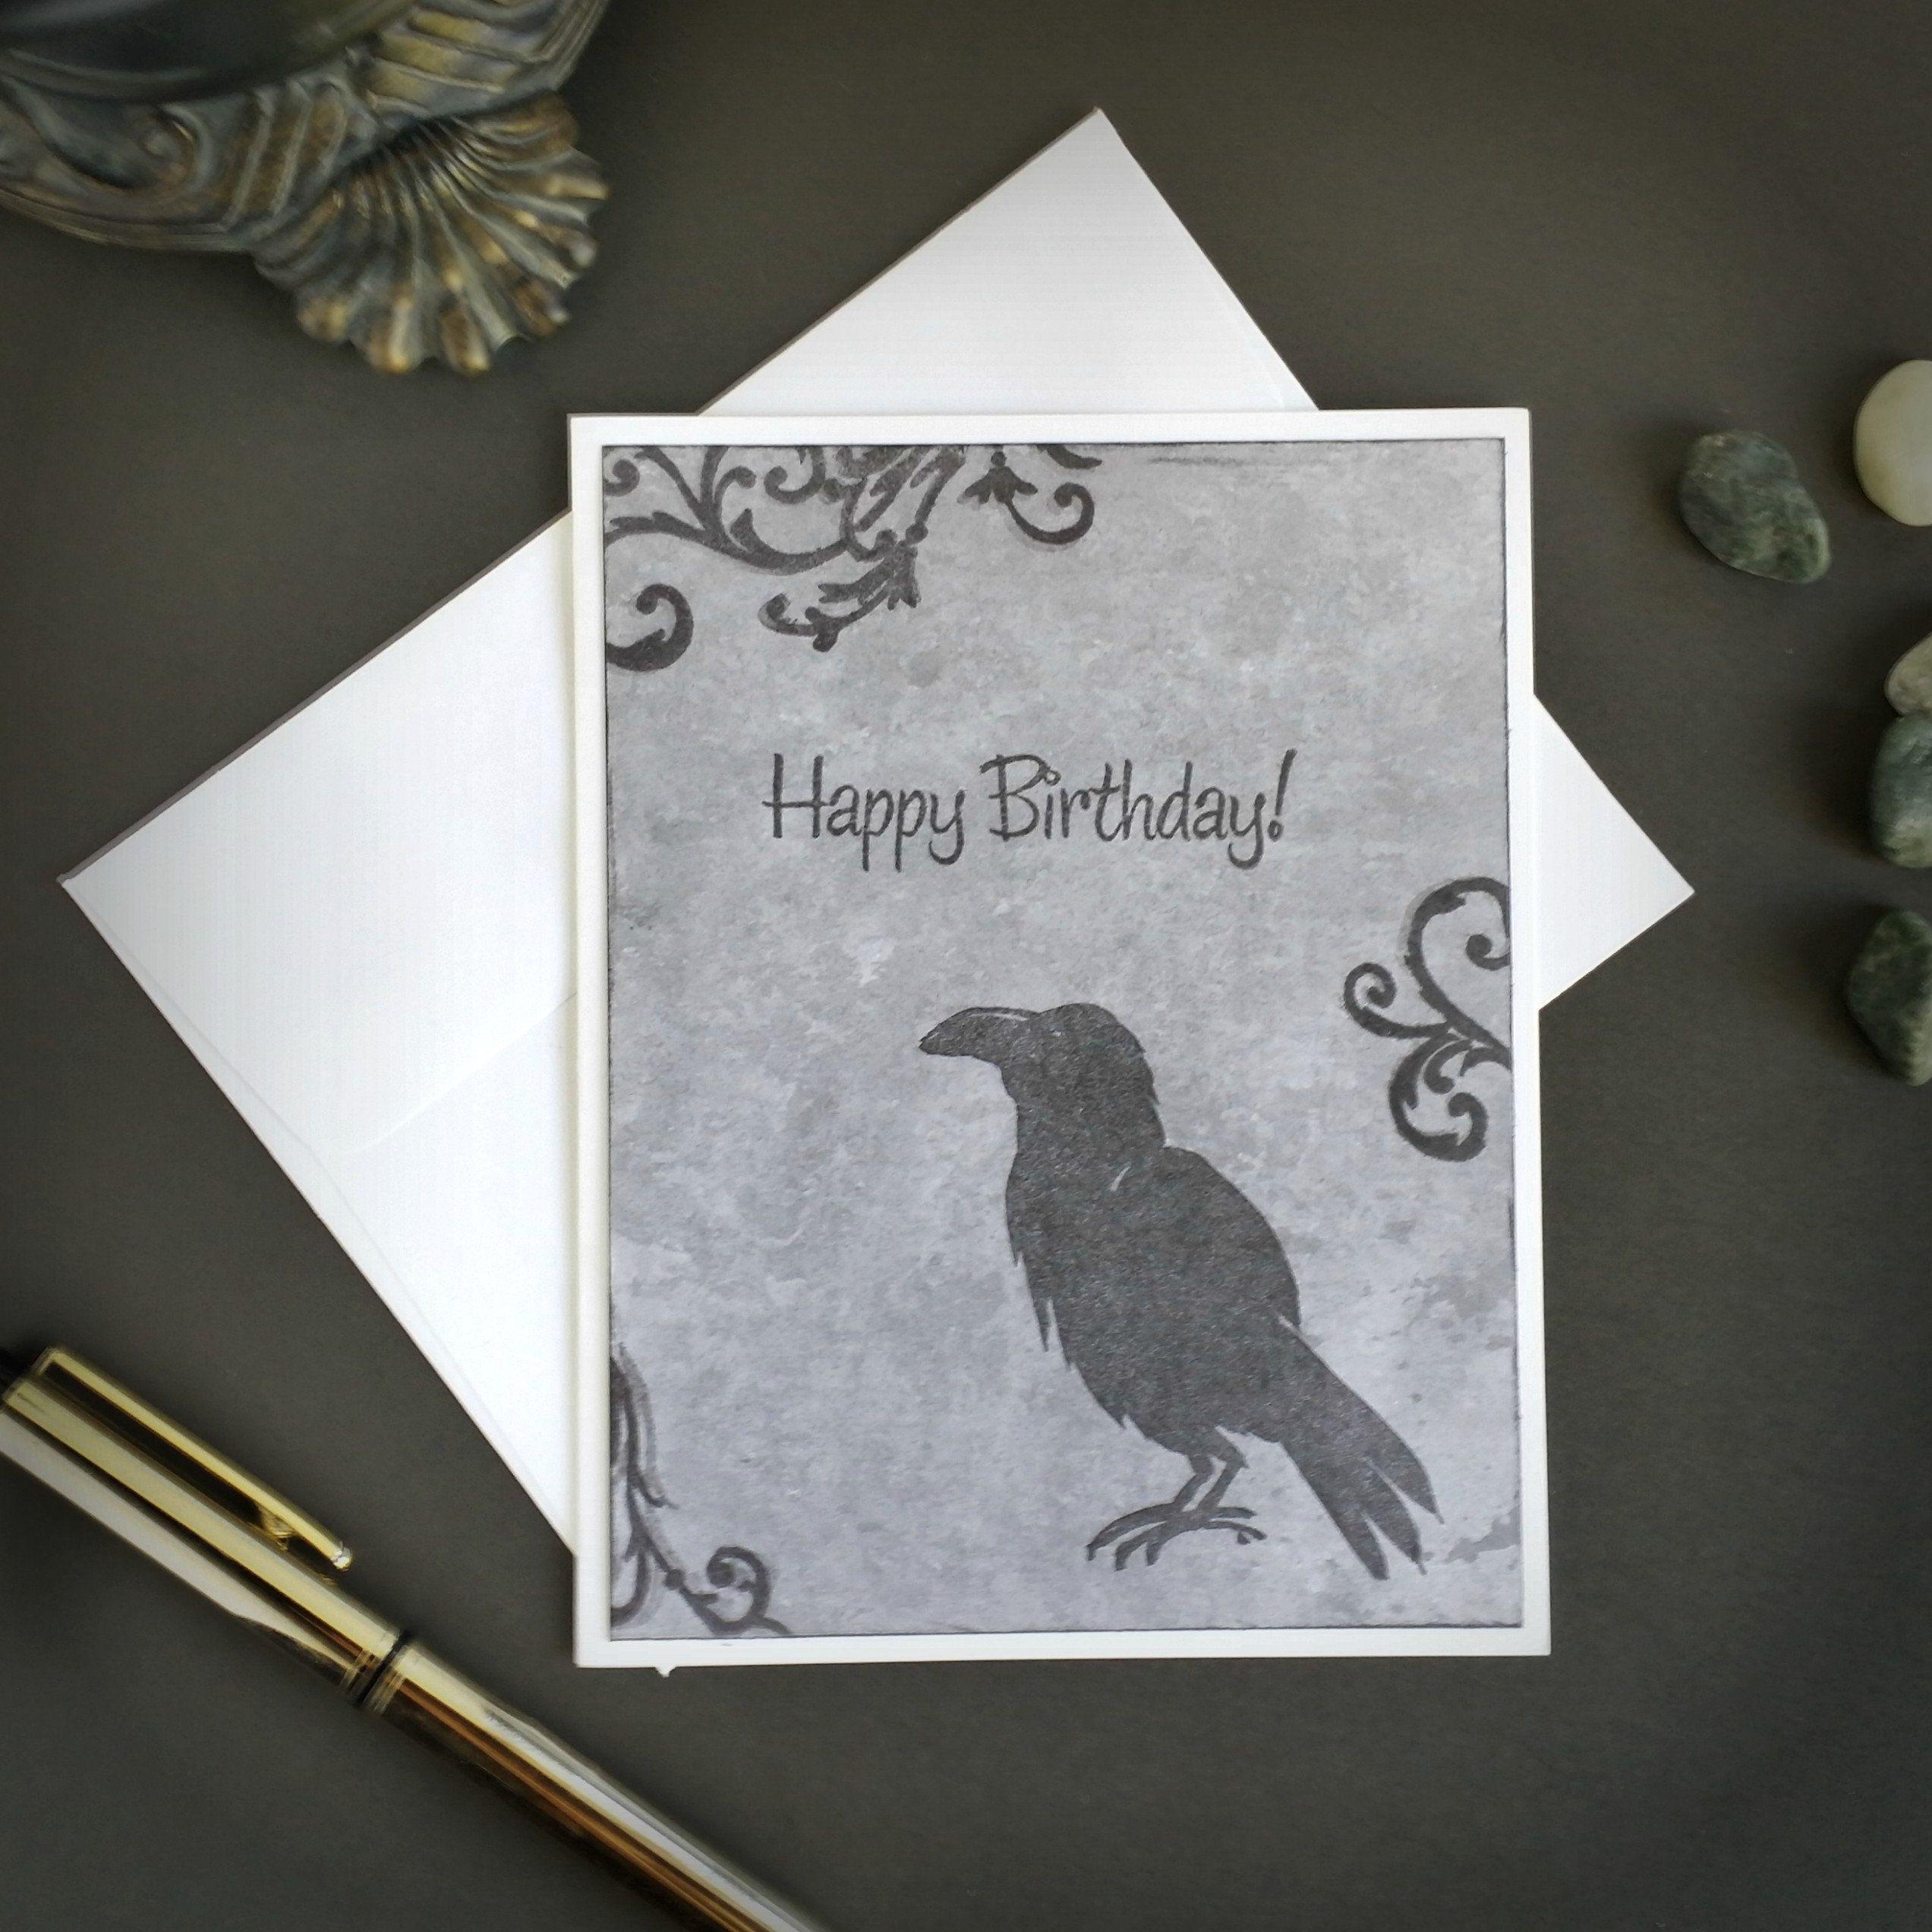 Raven Birthday Card Gothic Birthday Card Gothic Greeting Card Raven Card Dark Birthday Card Dark Card E Goth Greeting Cards Card Making Birthday Birthday Cards